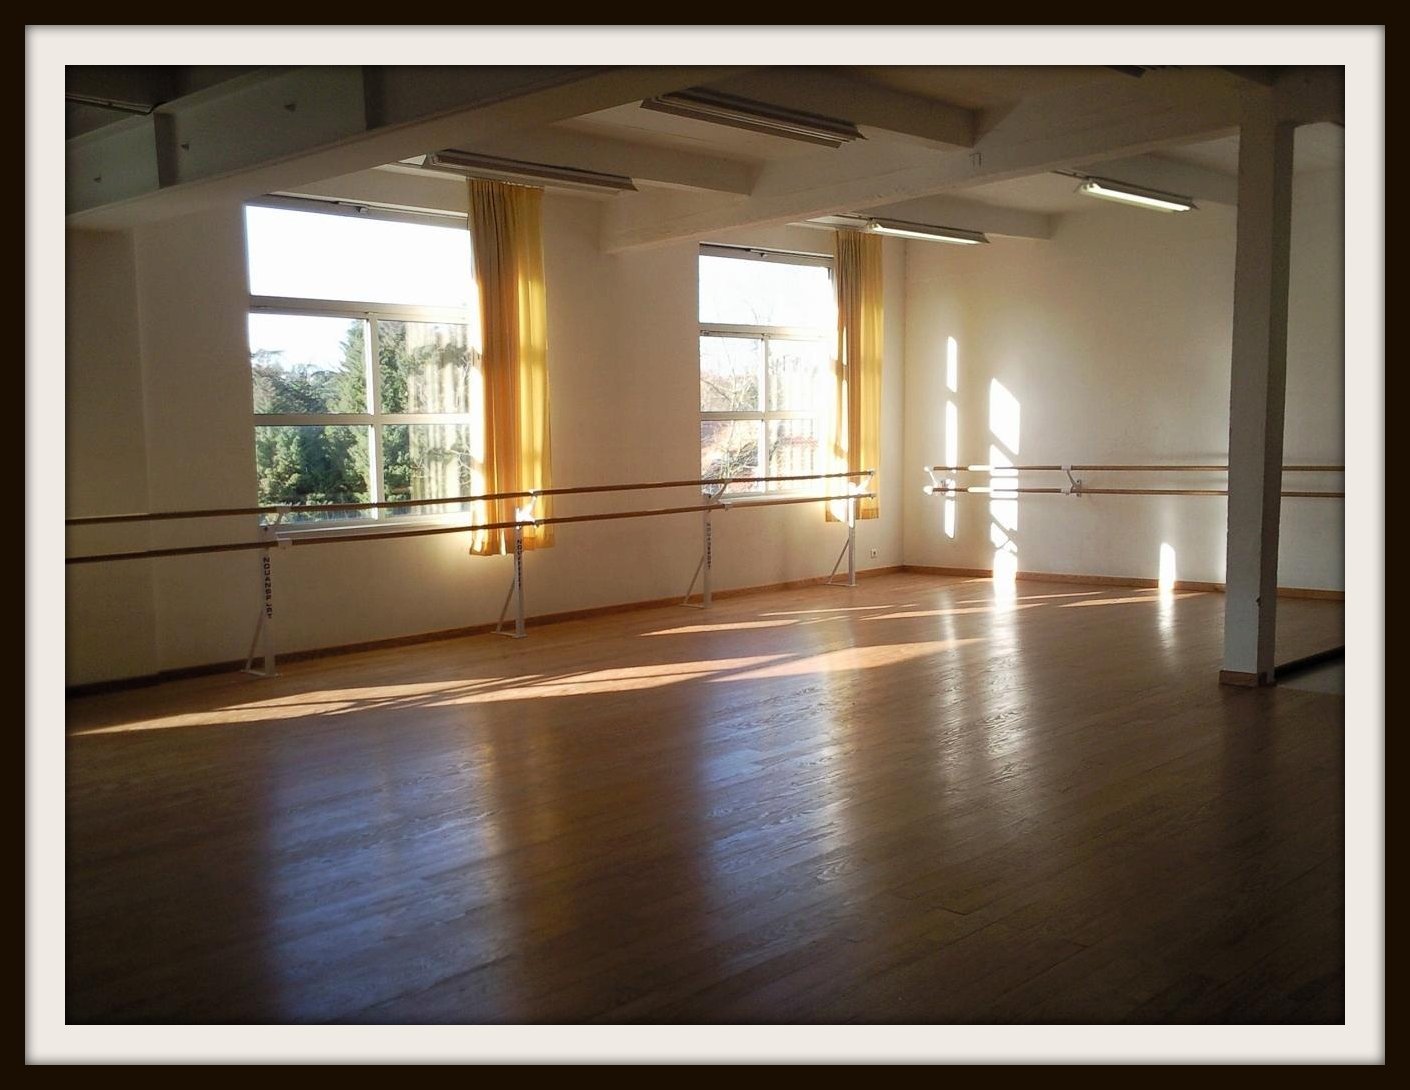 nos installations de gym et de danse hasparren. Black Bedroom Furniture Sets. Home Design Ideas